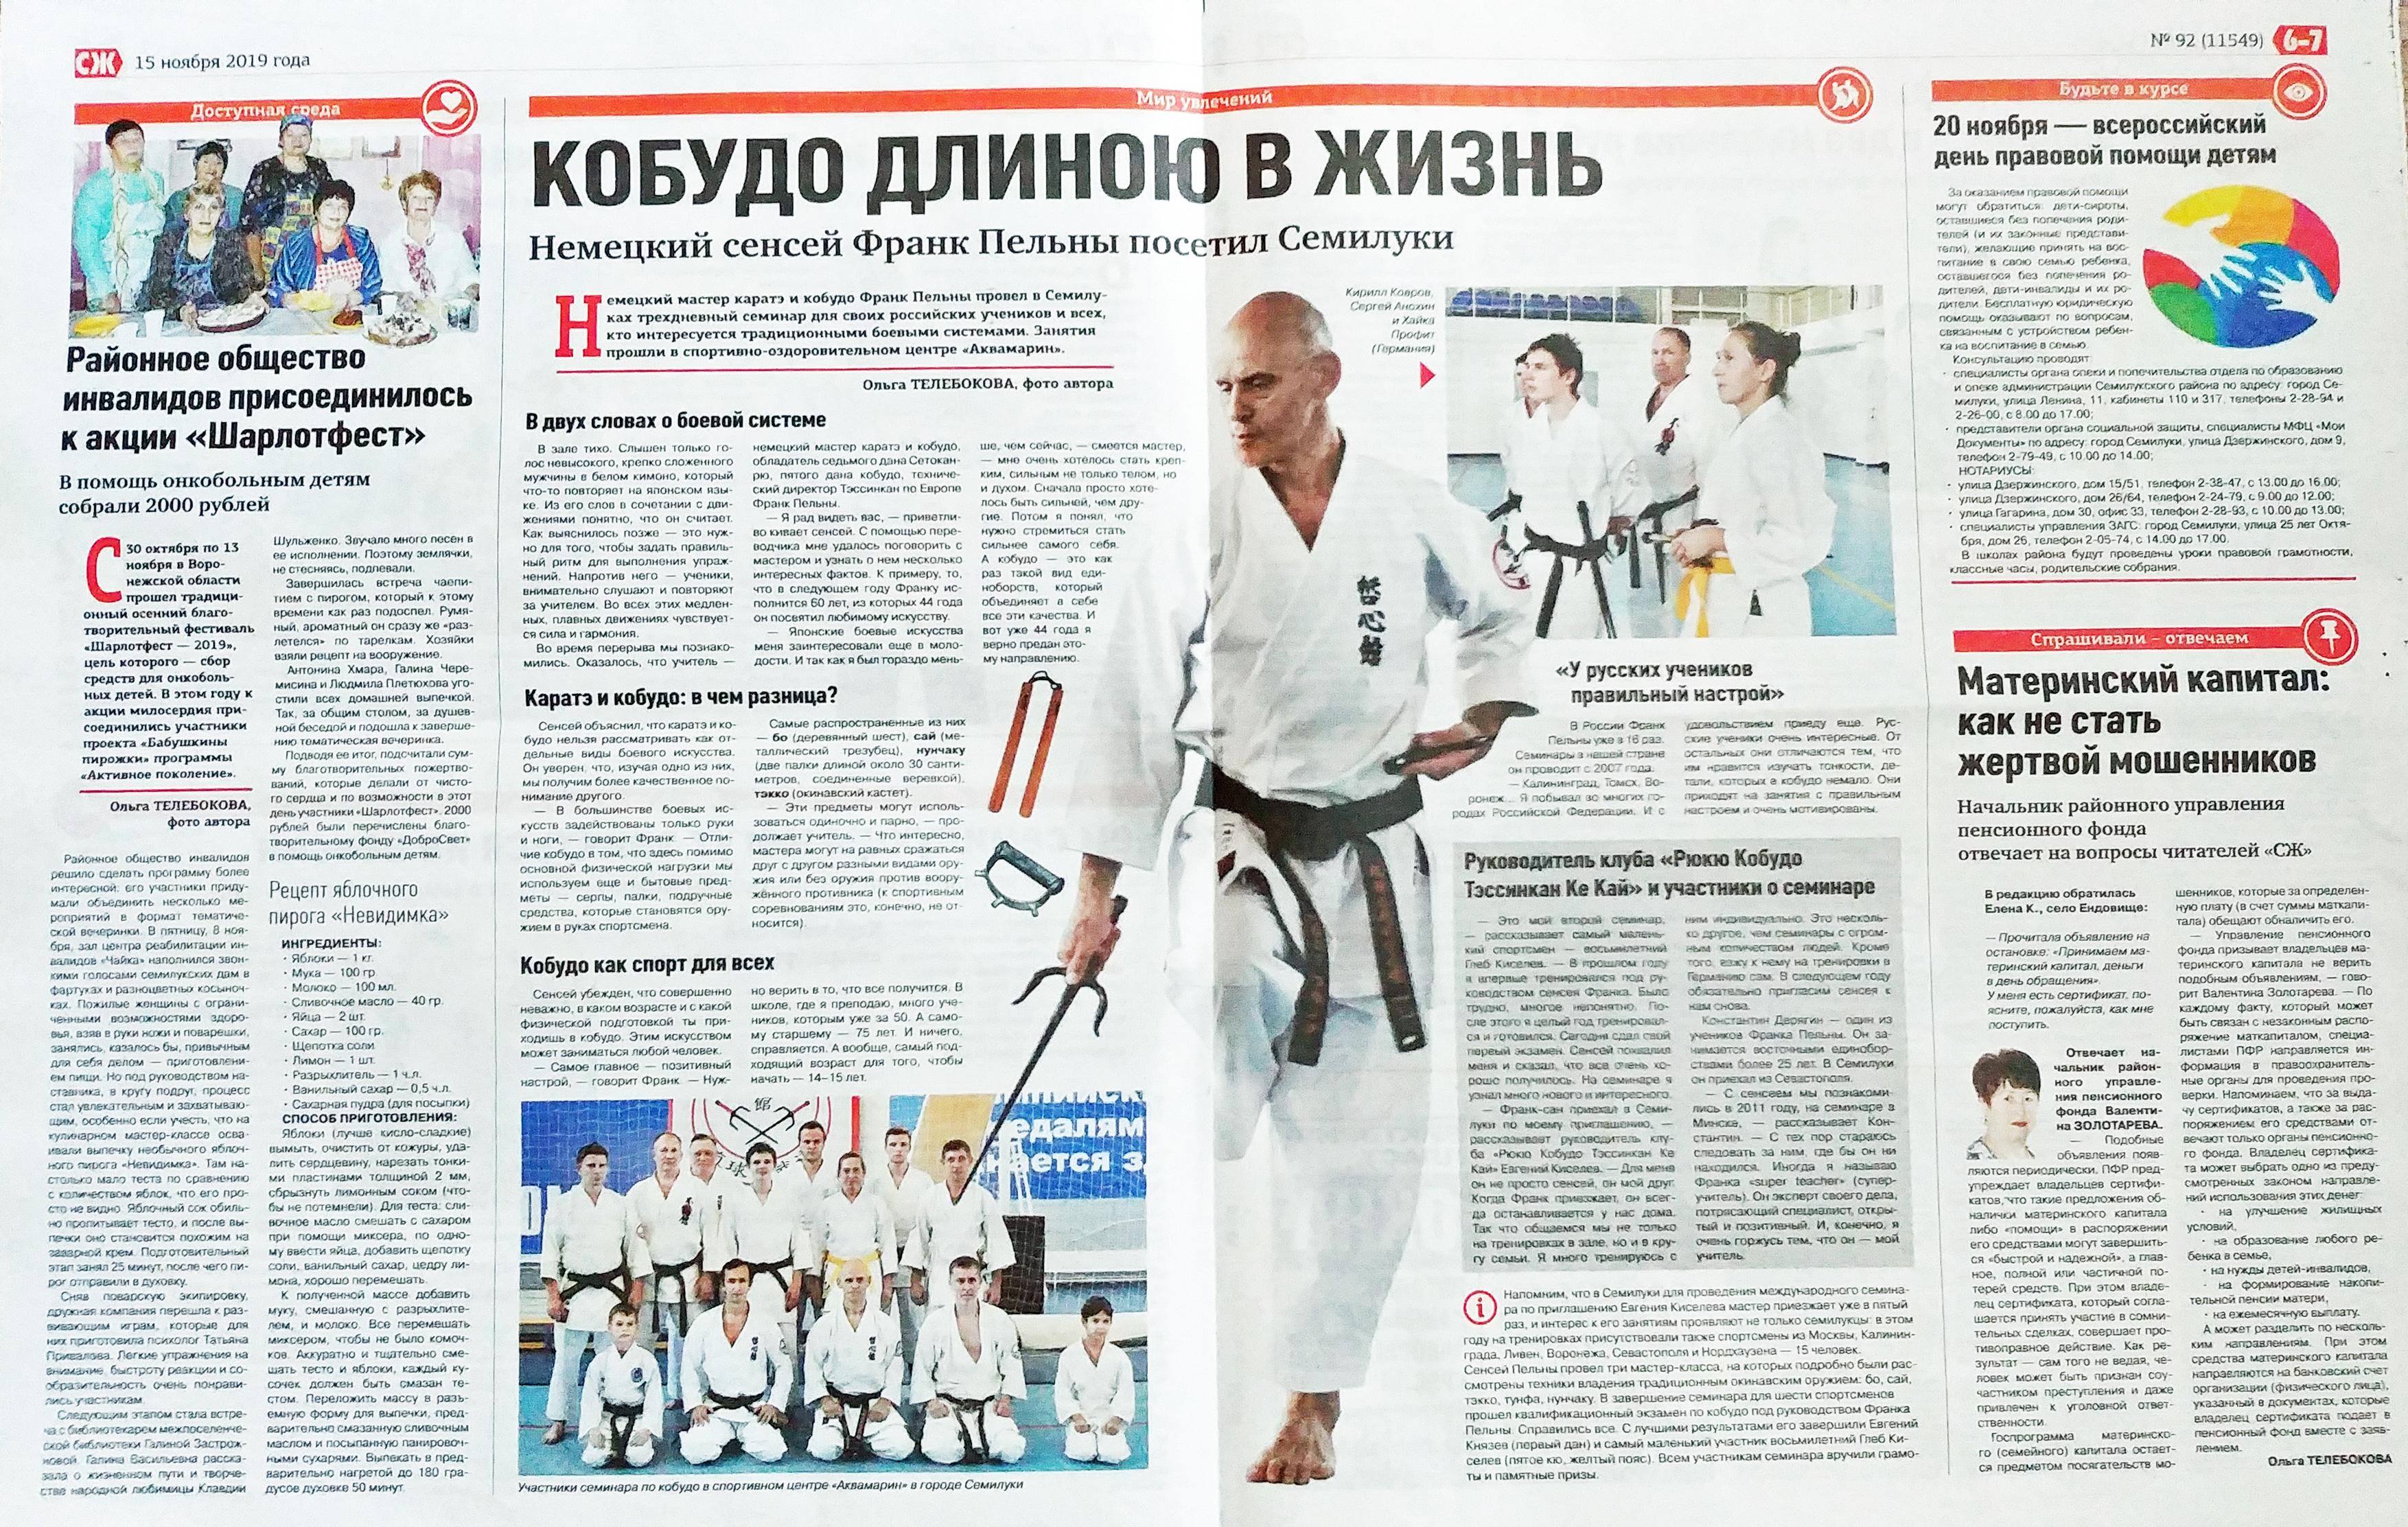 Newspaper Article from Semiluki